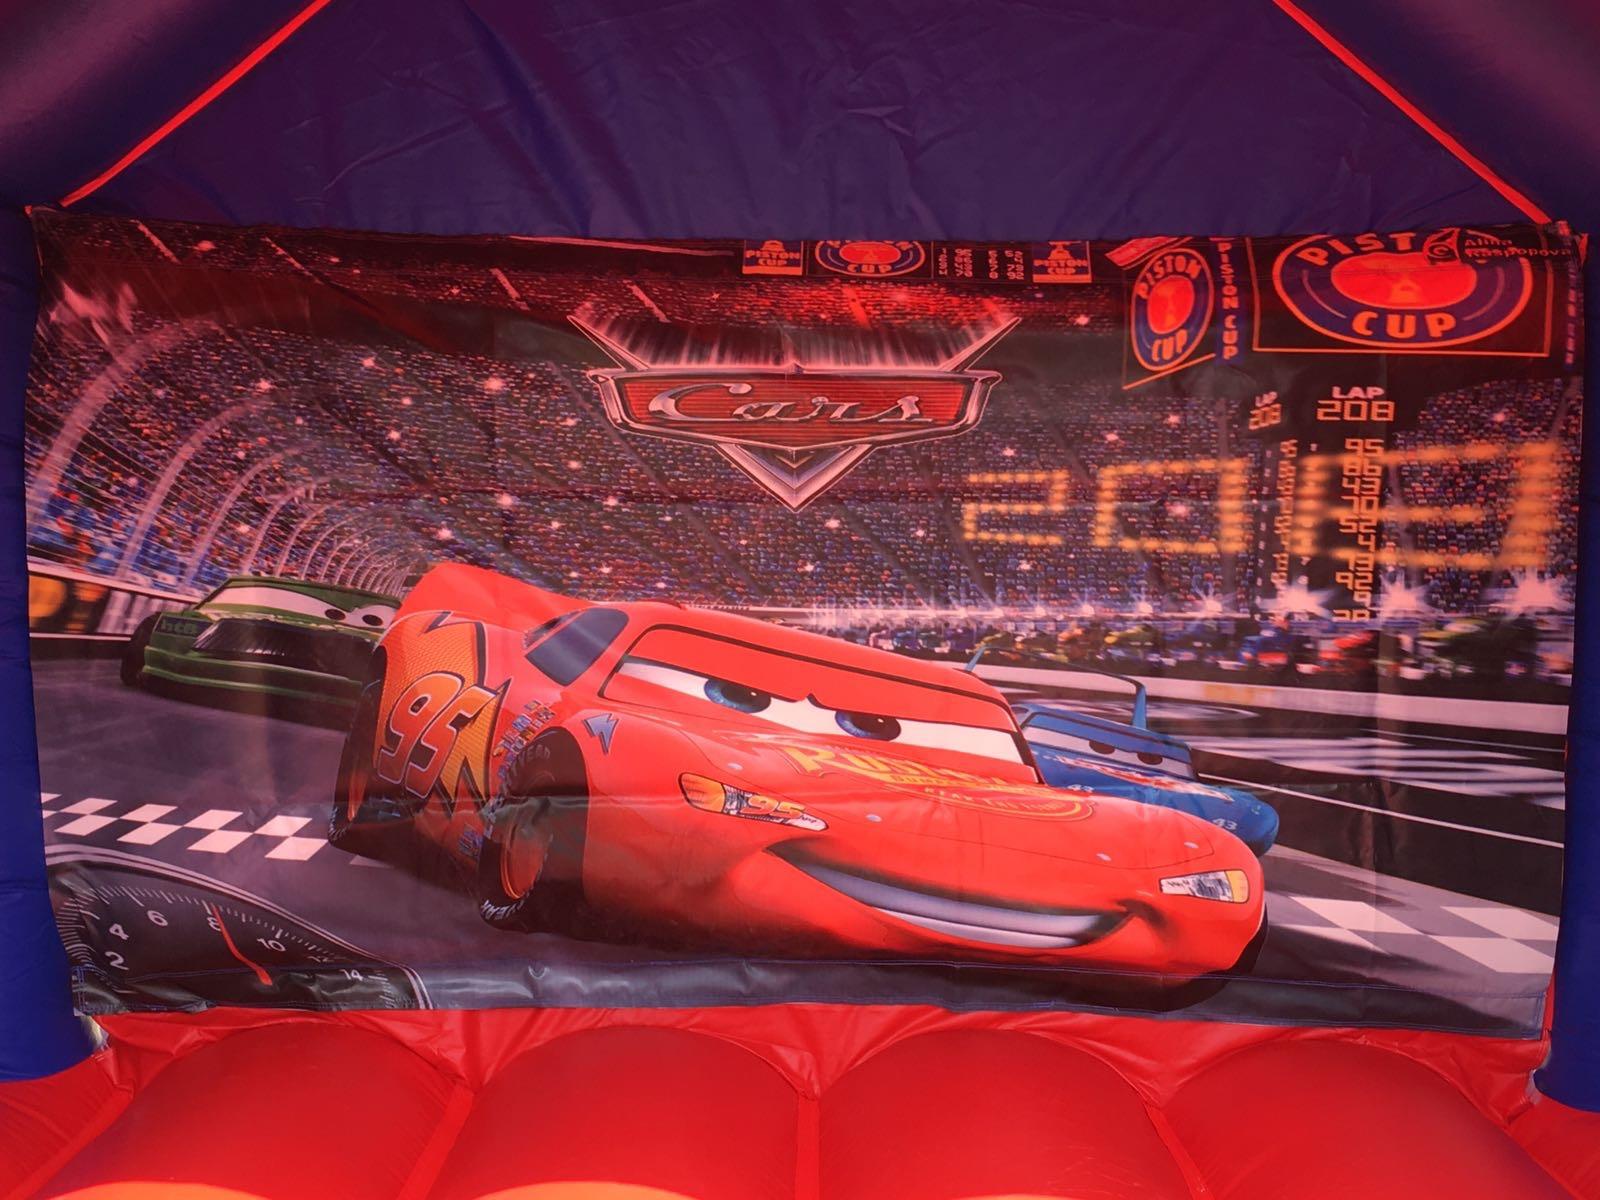 Cars bouncy castle hire with slide Mandurah